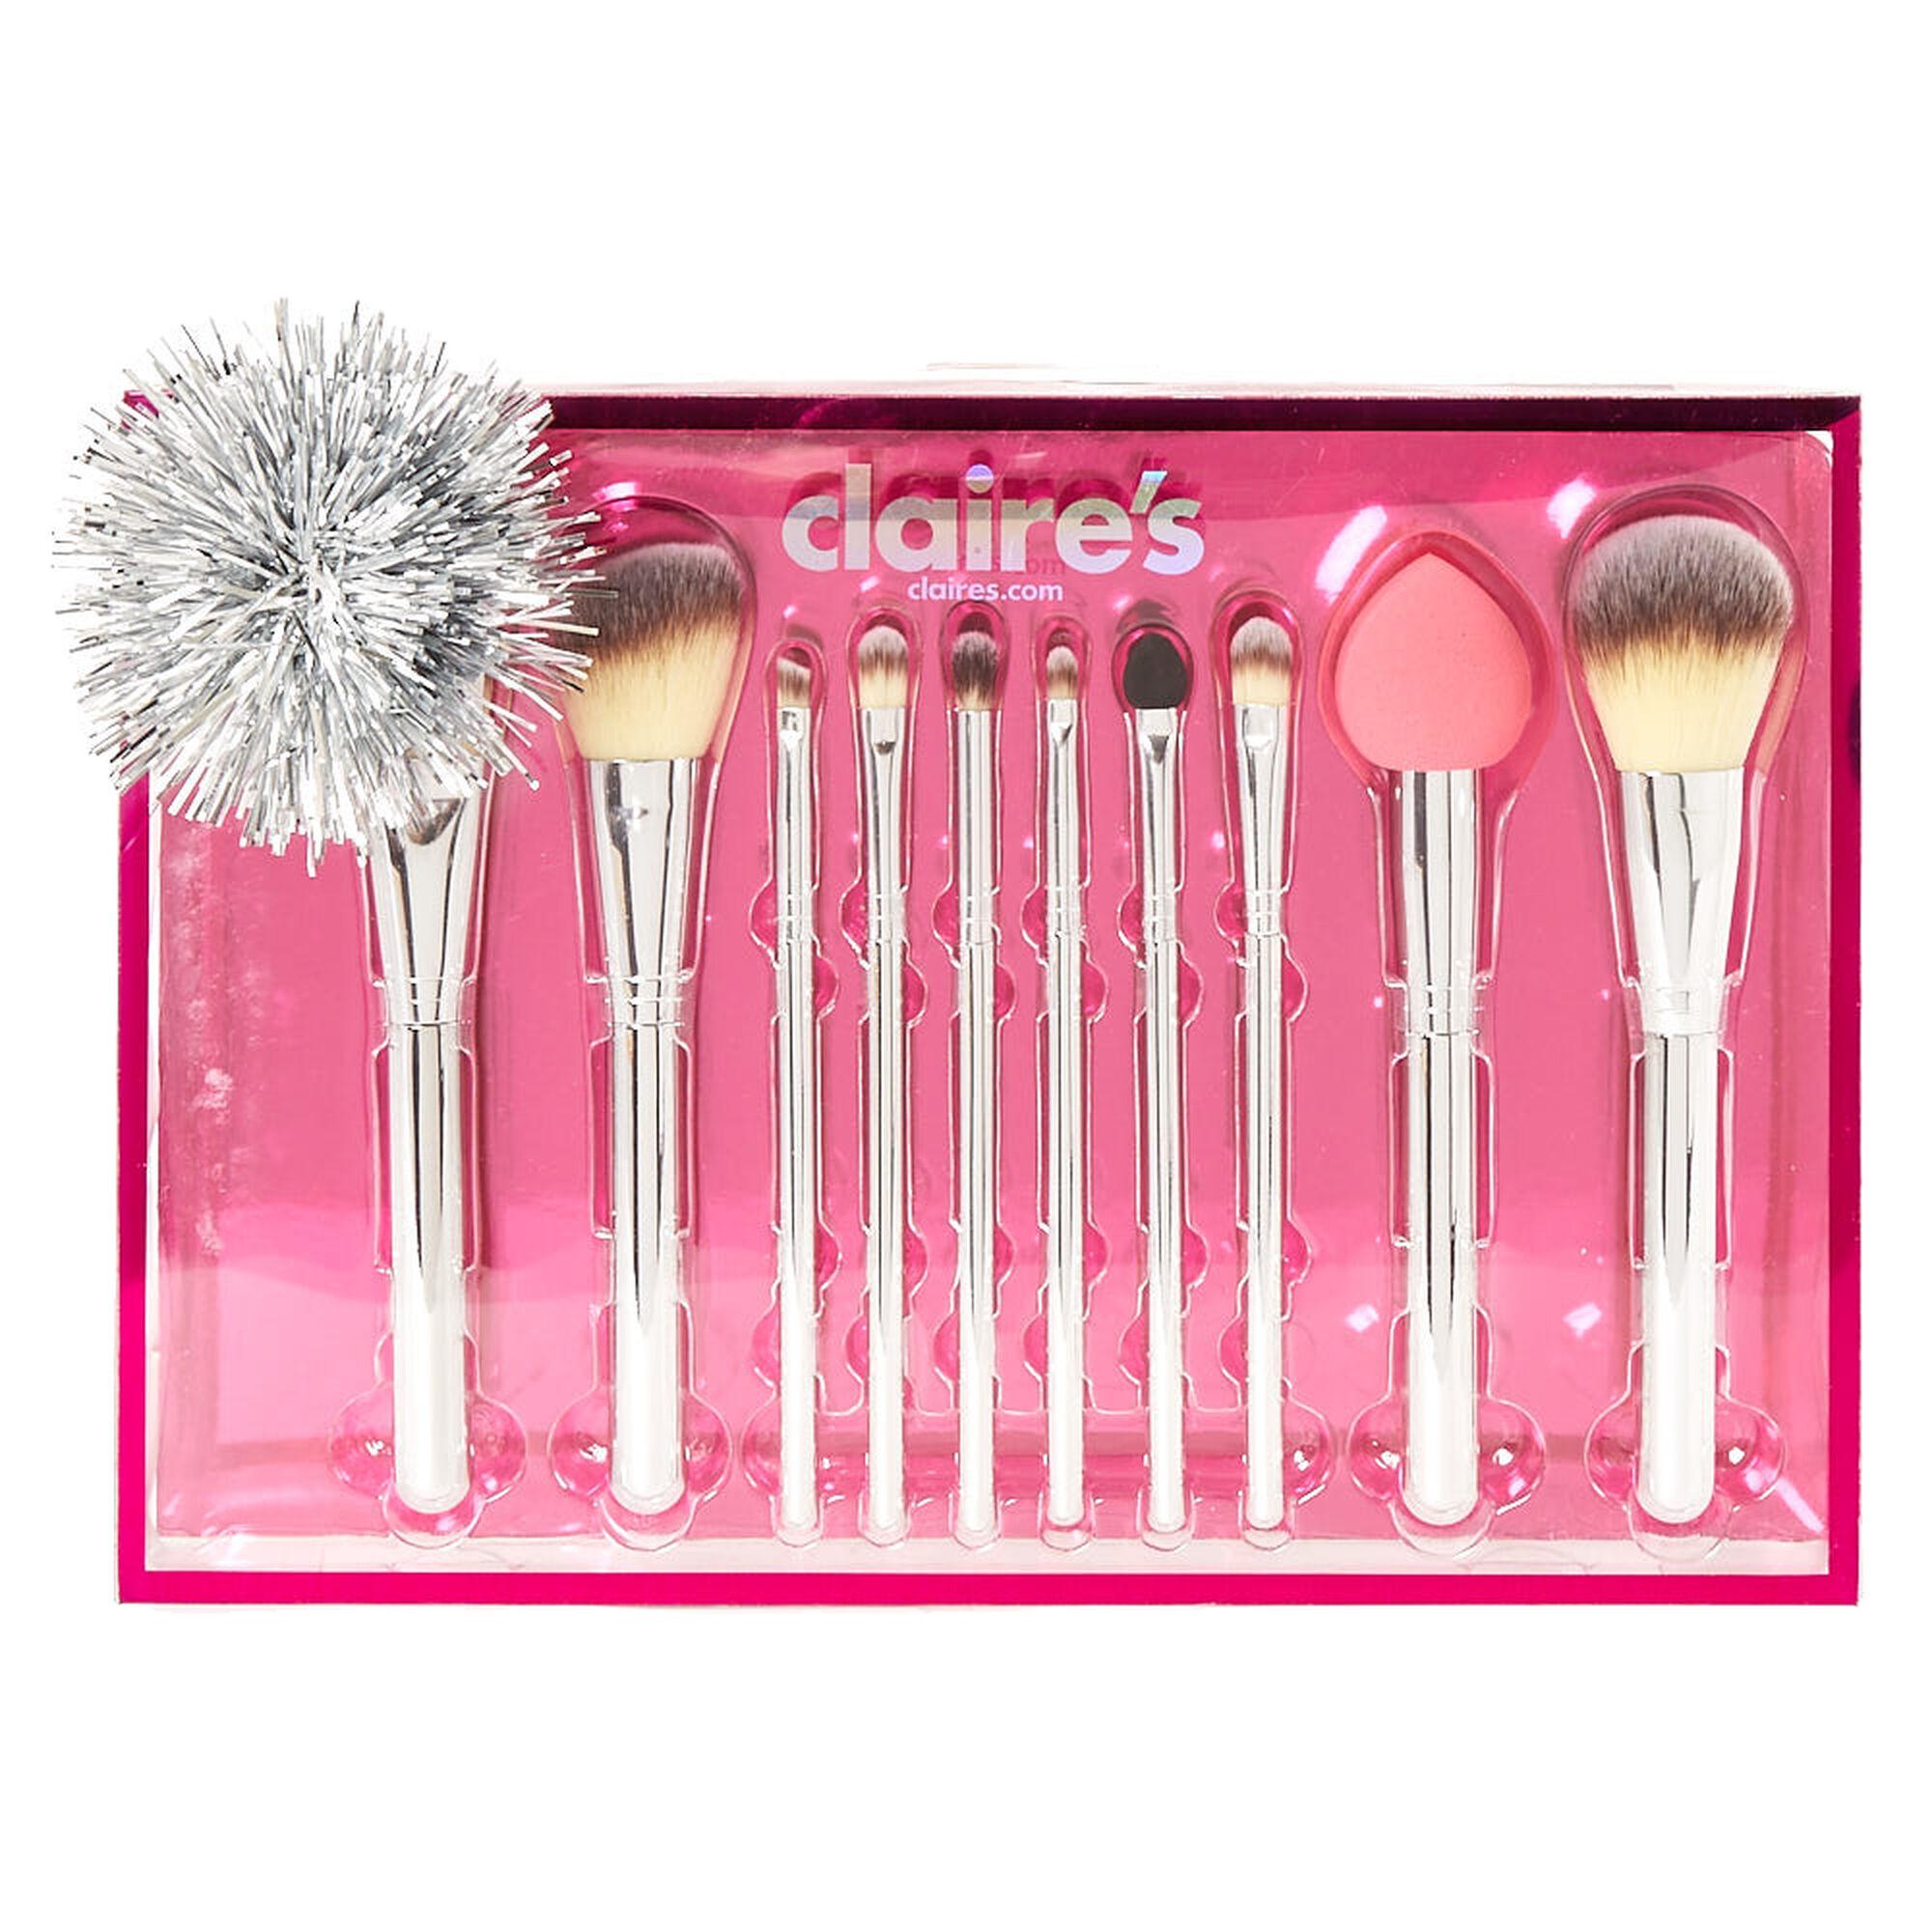 cosmetic brush set. chrome silver 10 piece makeup brush set, cosmetic set